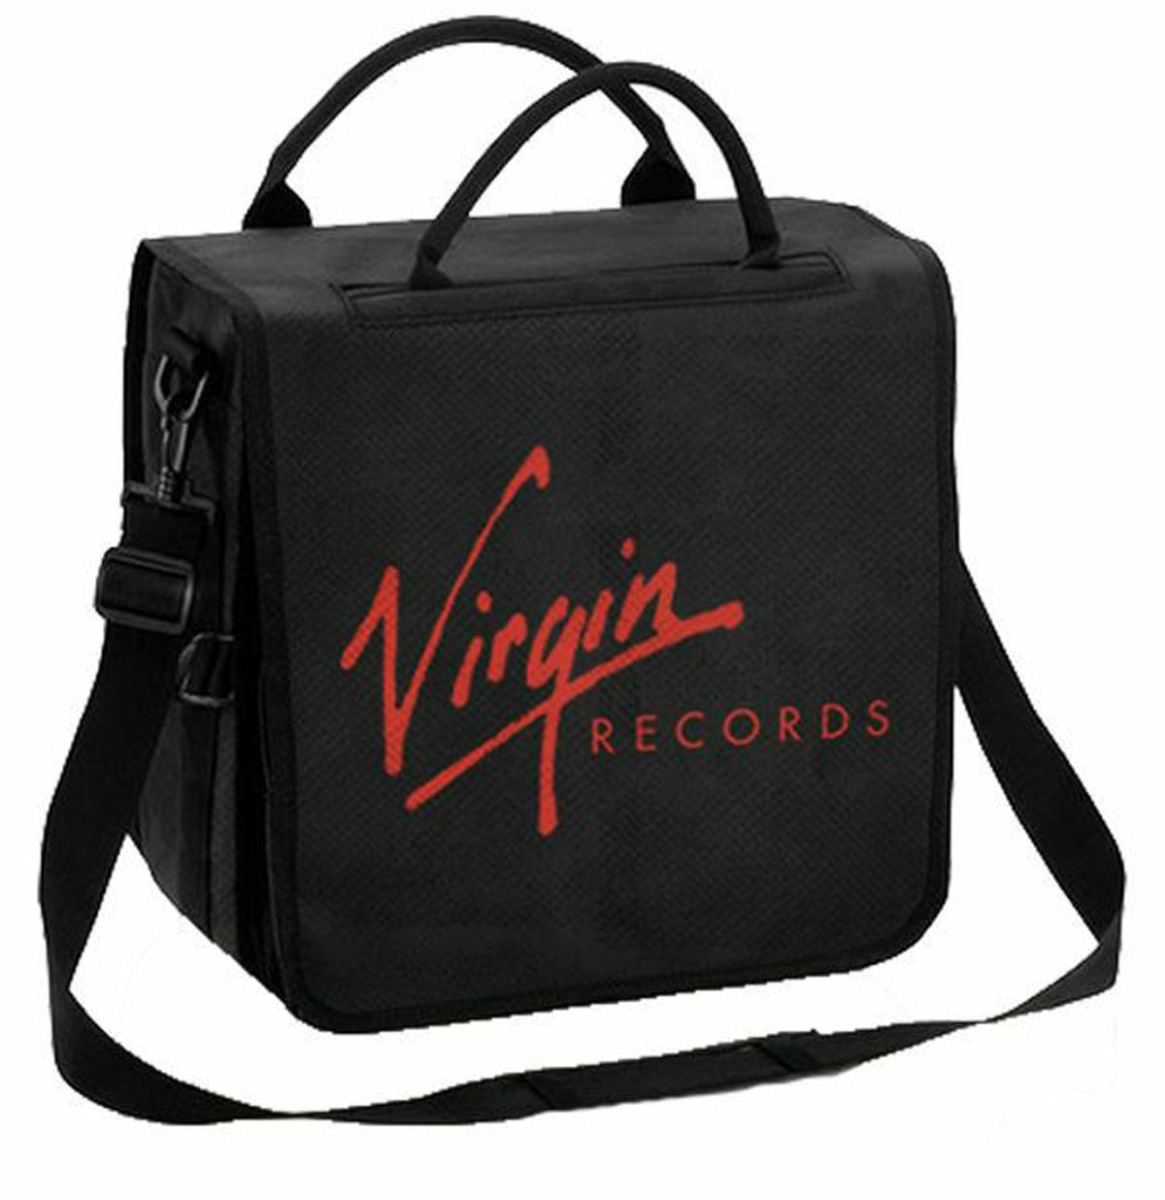 Virgin Records Flaptop Platentas